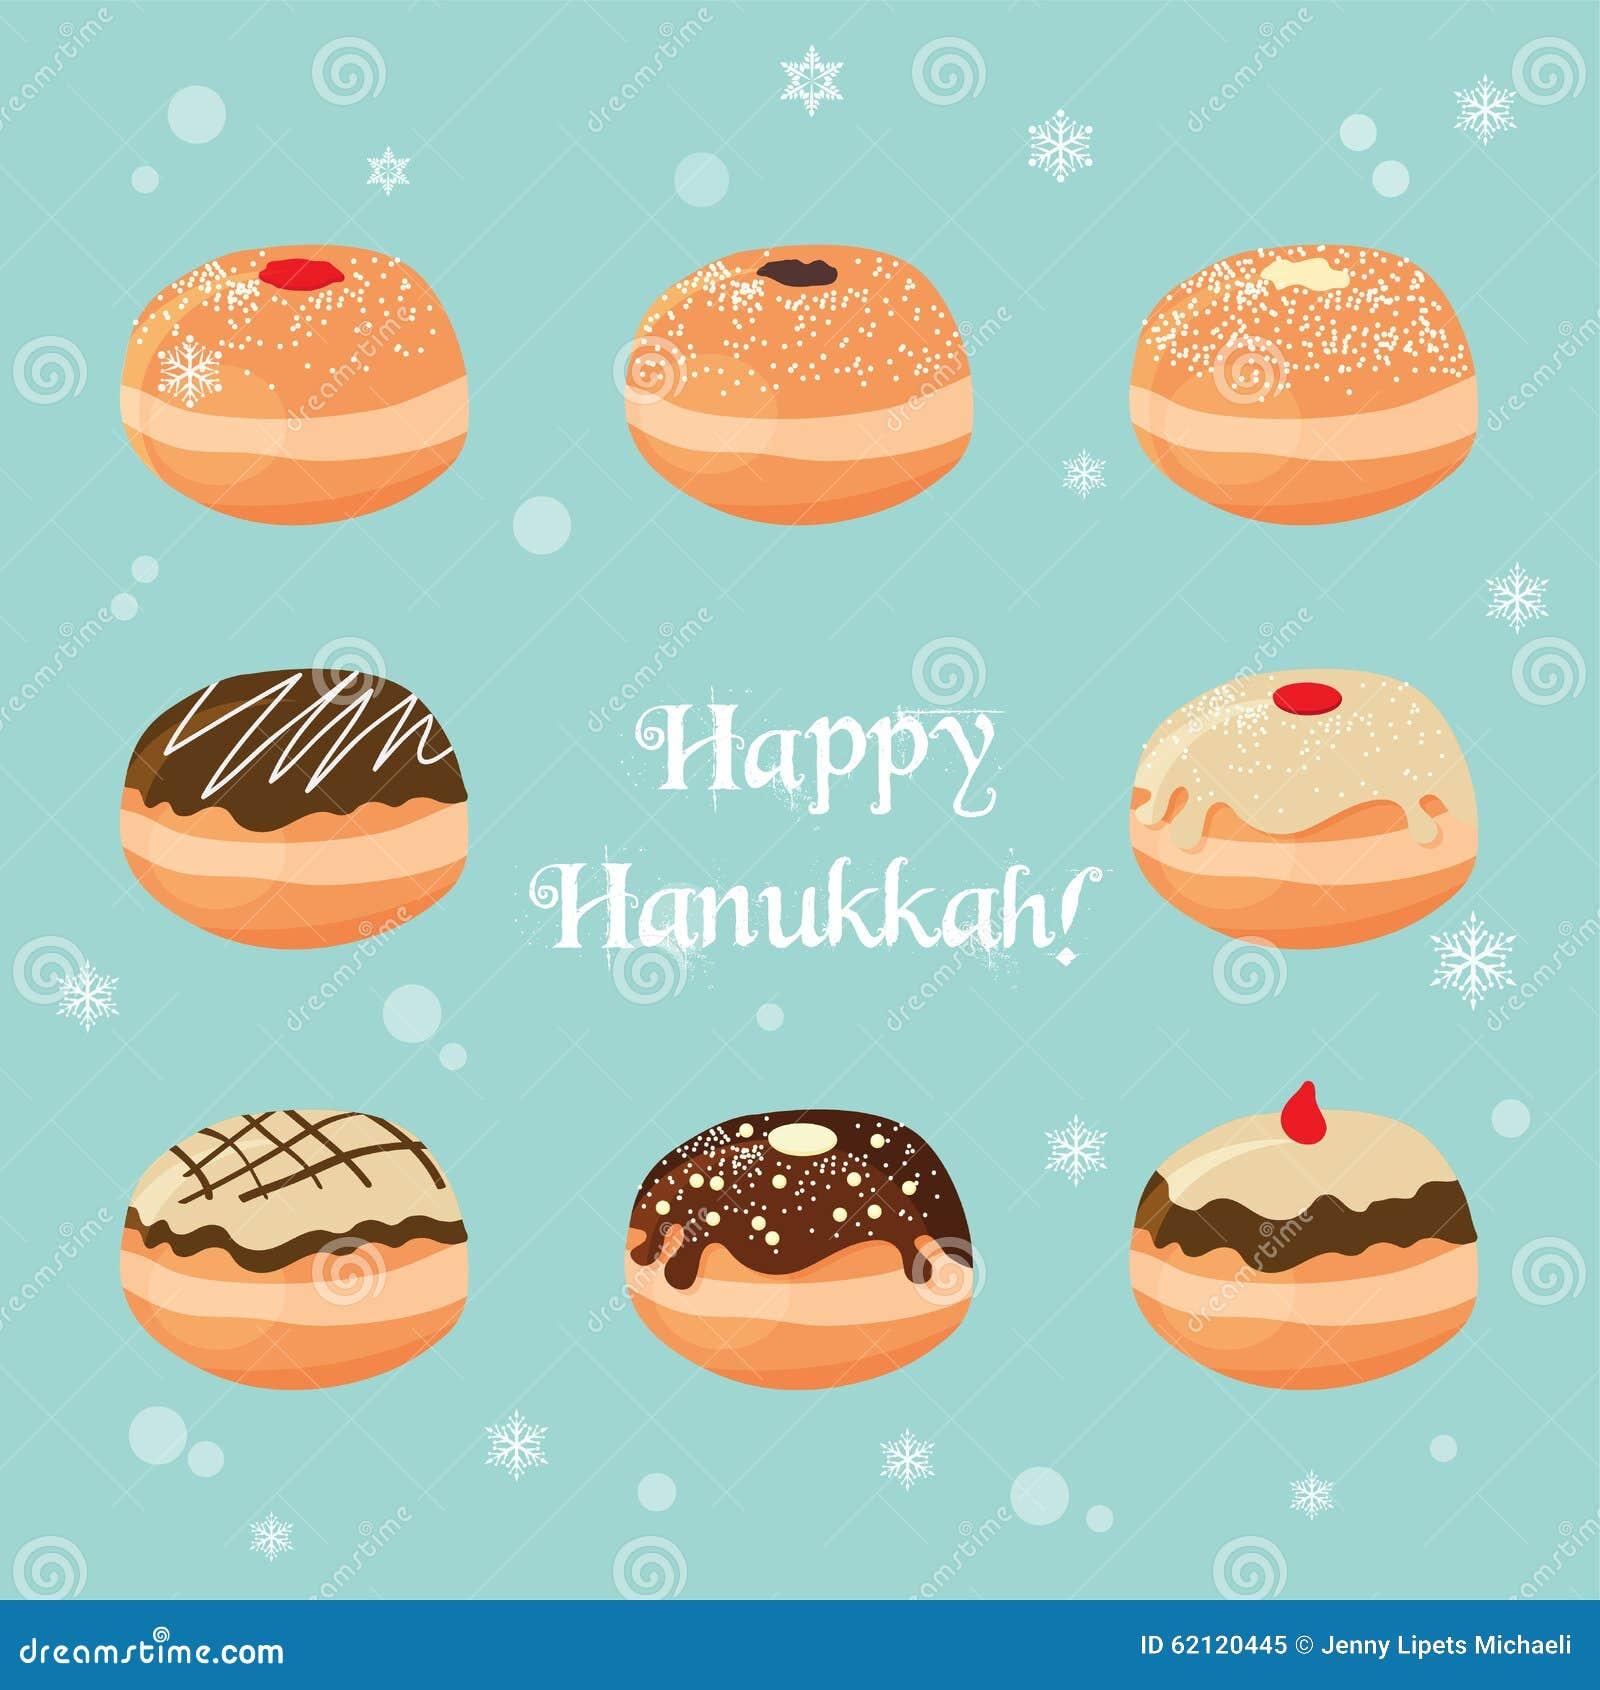 Hanukkah Doughnut . Traditional Jewish Holiday Stock Vector - Image ...